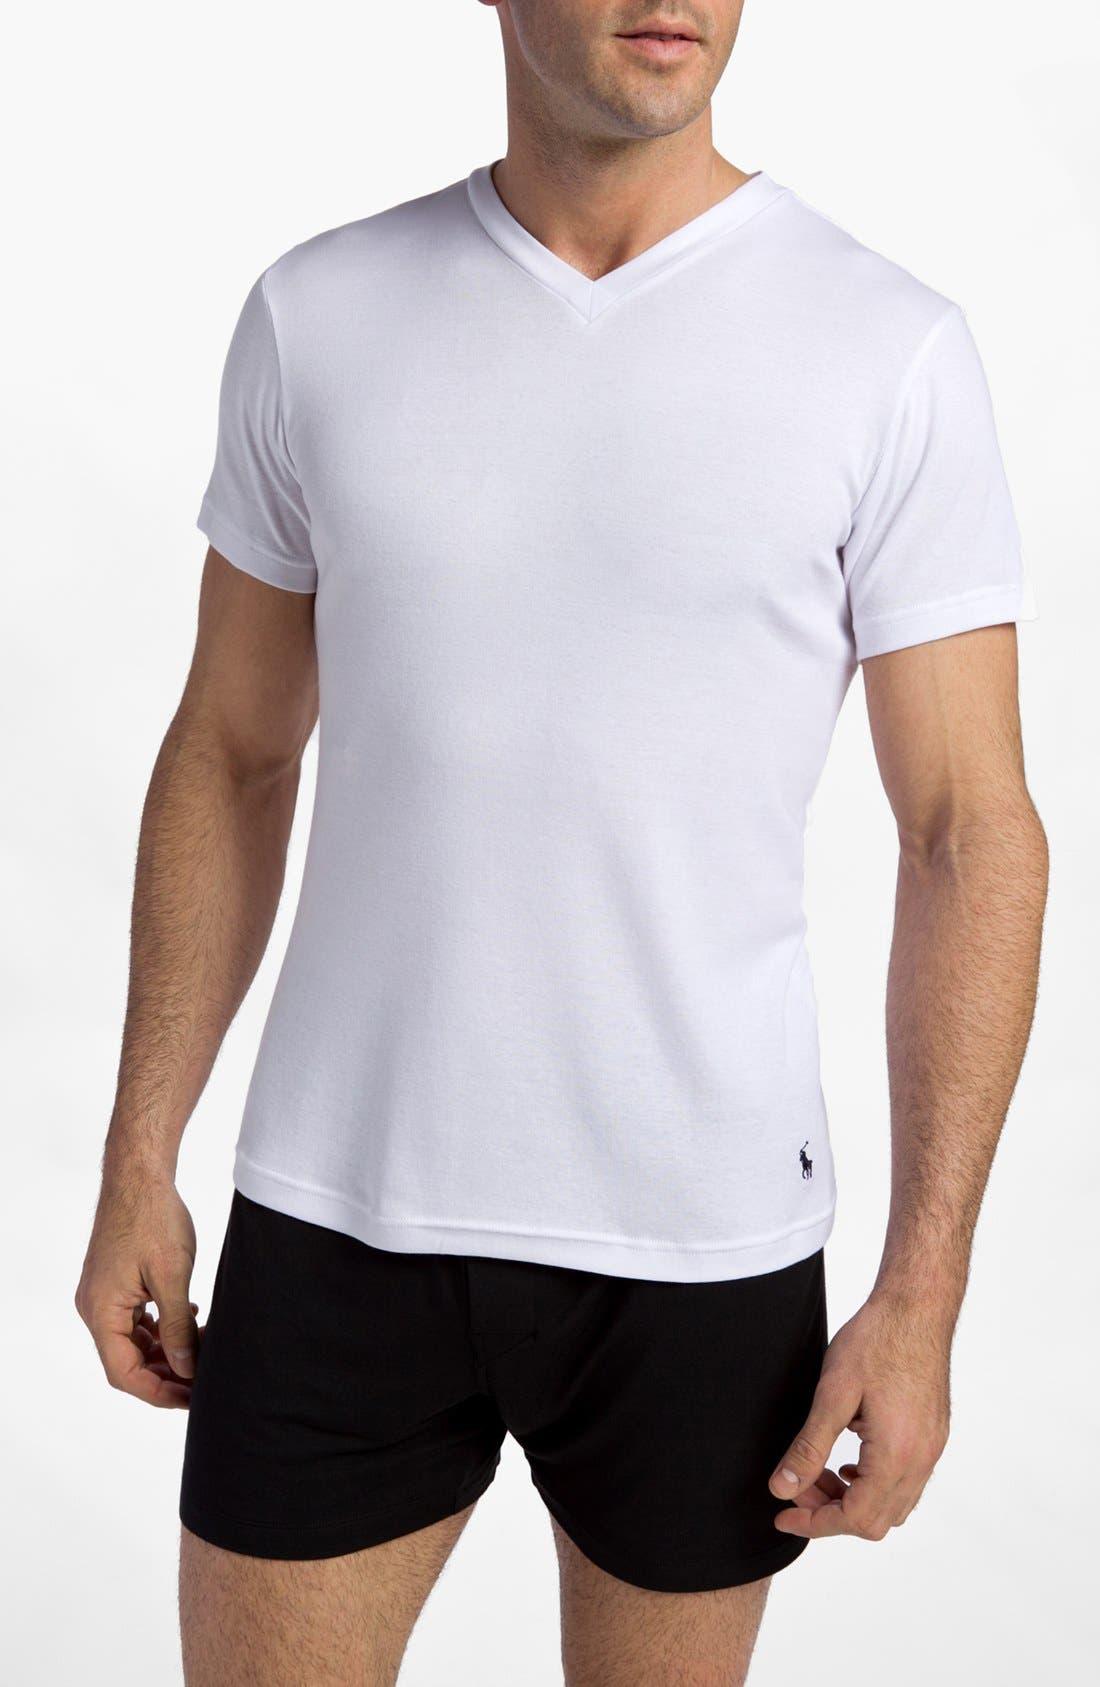 Main Image - Polo Ralph Lauren 2-Pack V-Neck T-Shirt (Big)